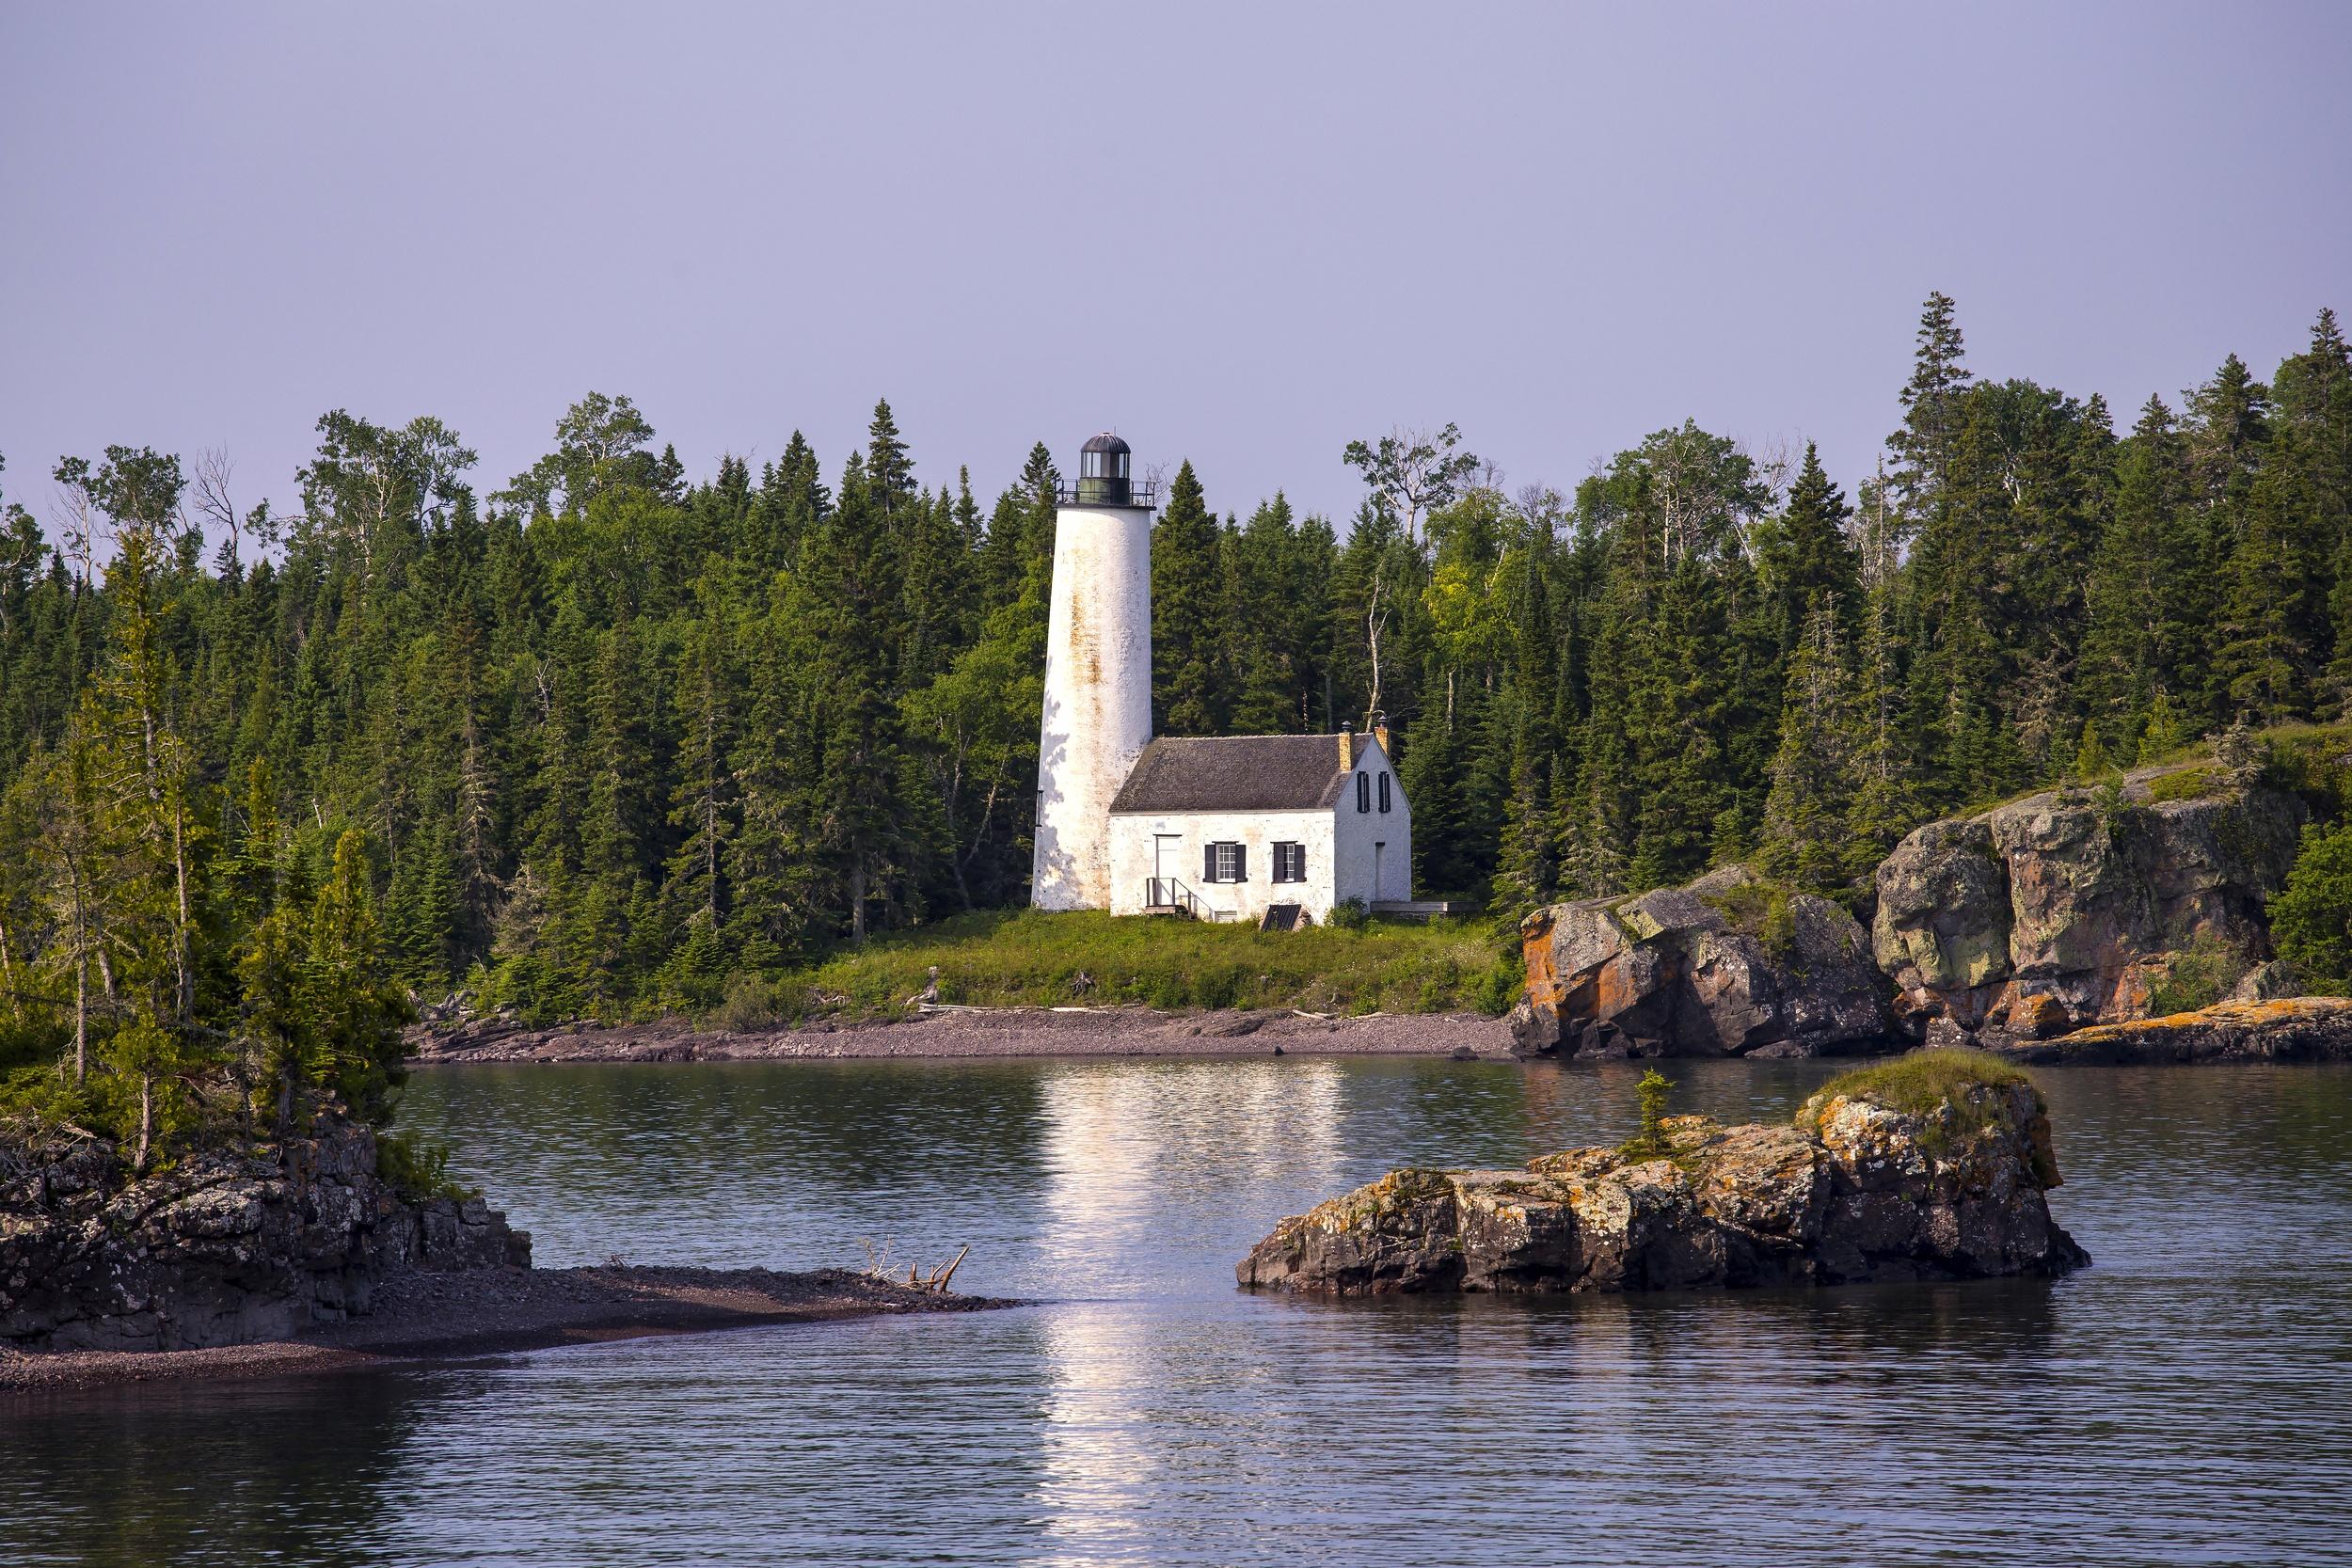 Isle Royale Light, a lighthouse in Isle Royale National Park